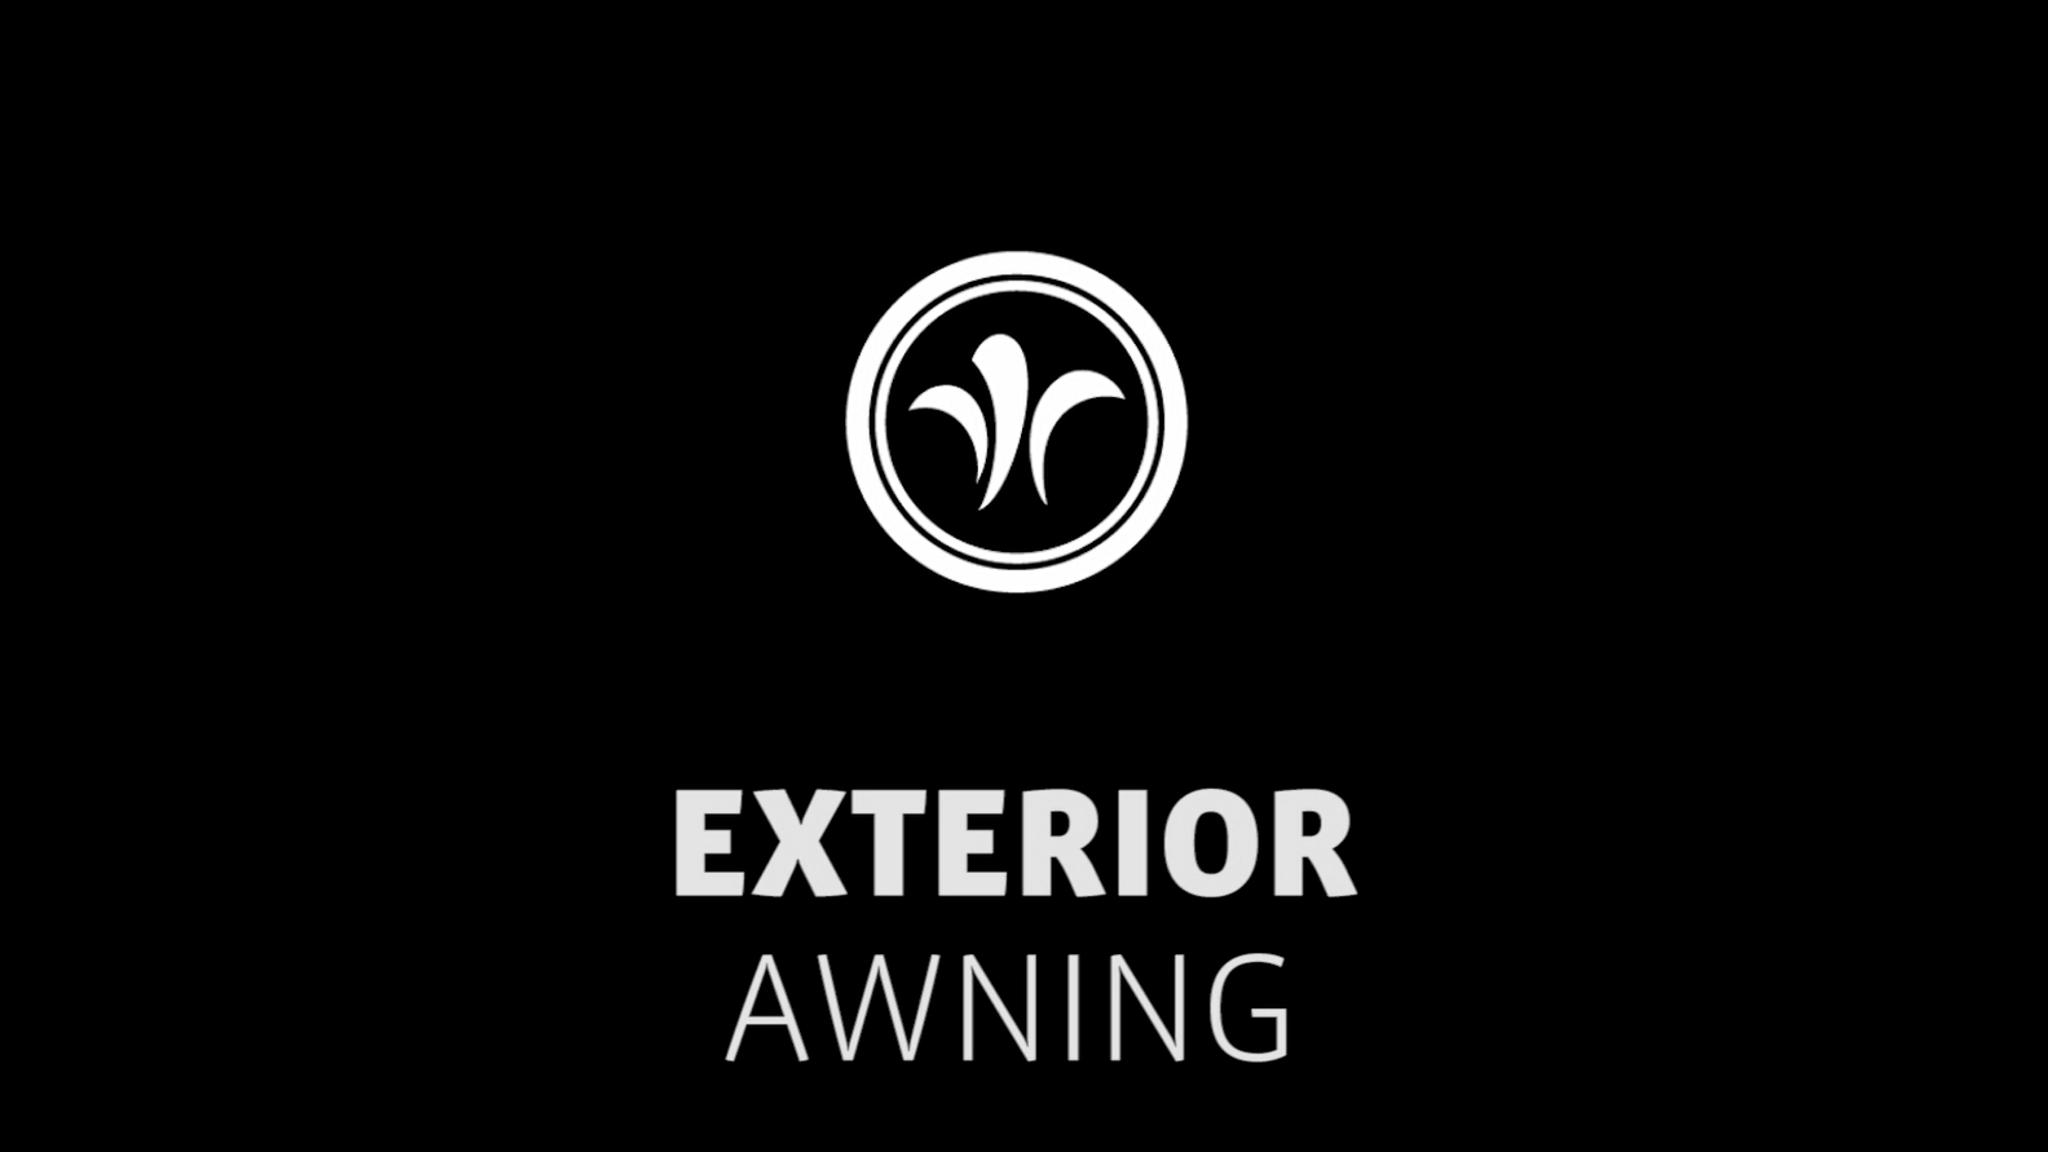 motorhome electrical awning // niesmann+bischoff - camper (model ARTO) // 2019 // EX2